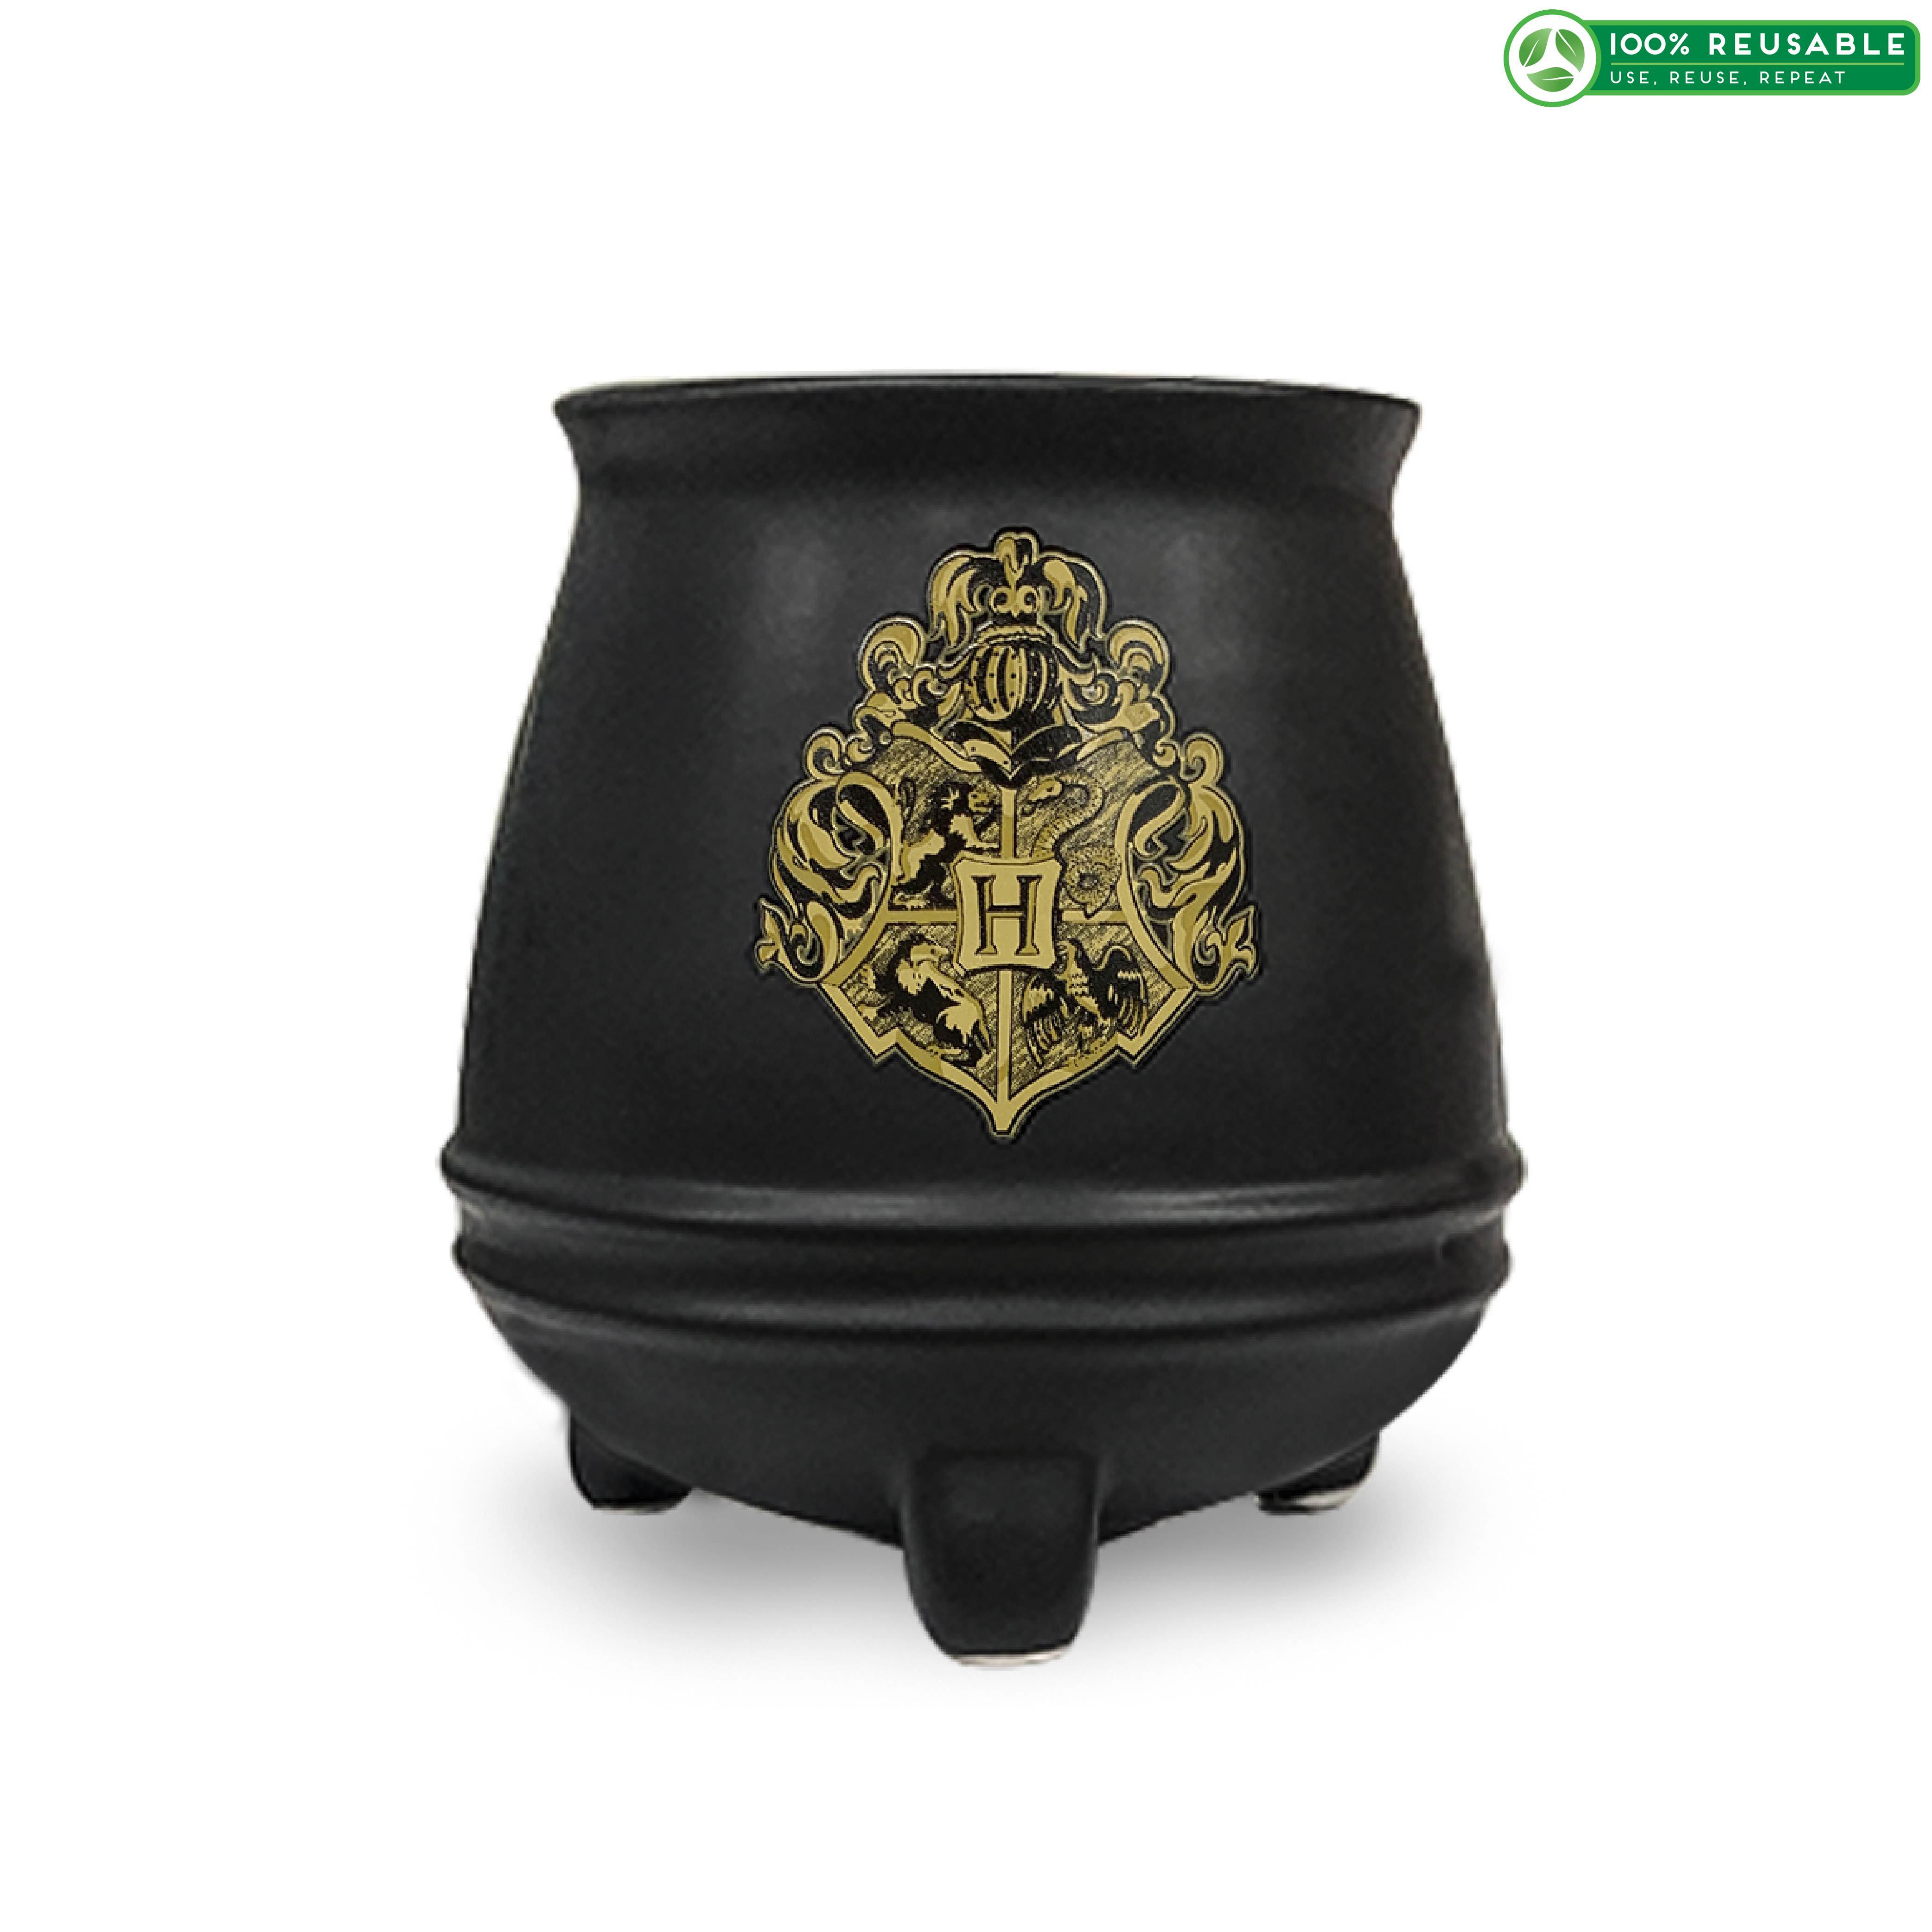 Harry Potter 11 oz. Coffee Mug, Cauldron image